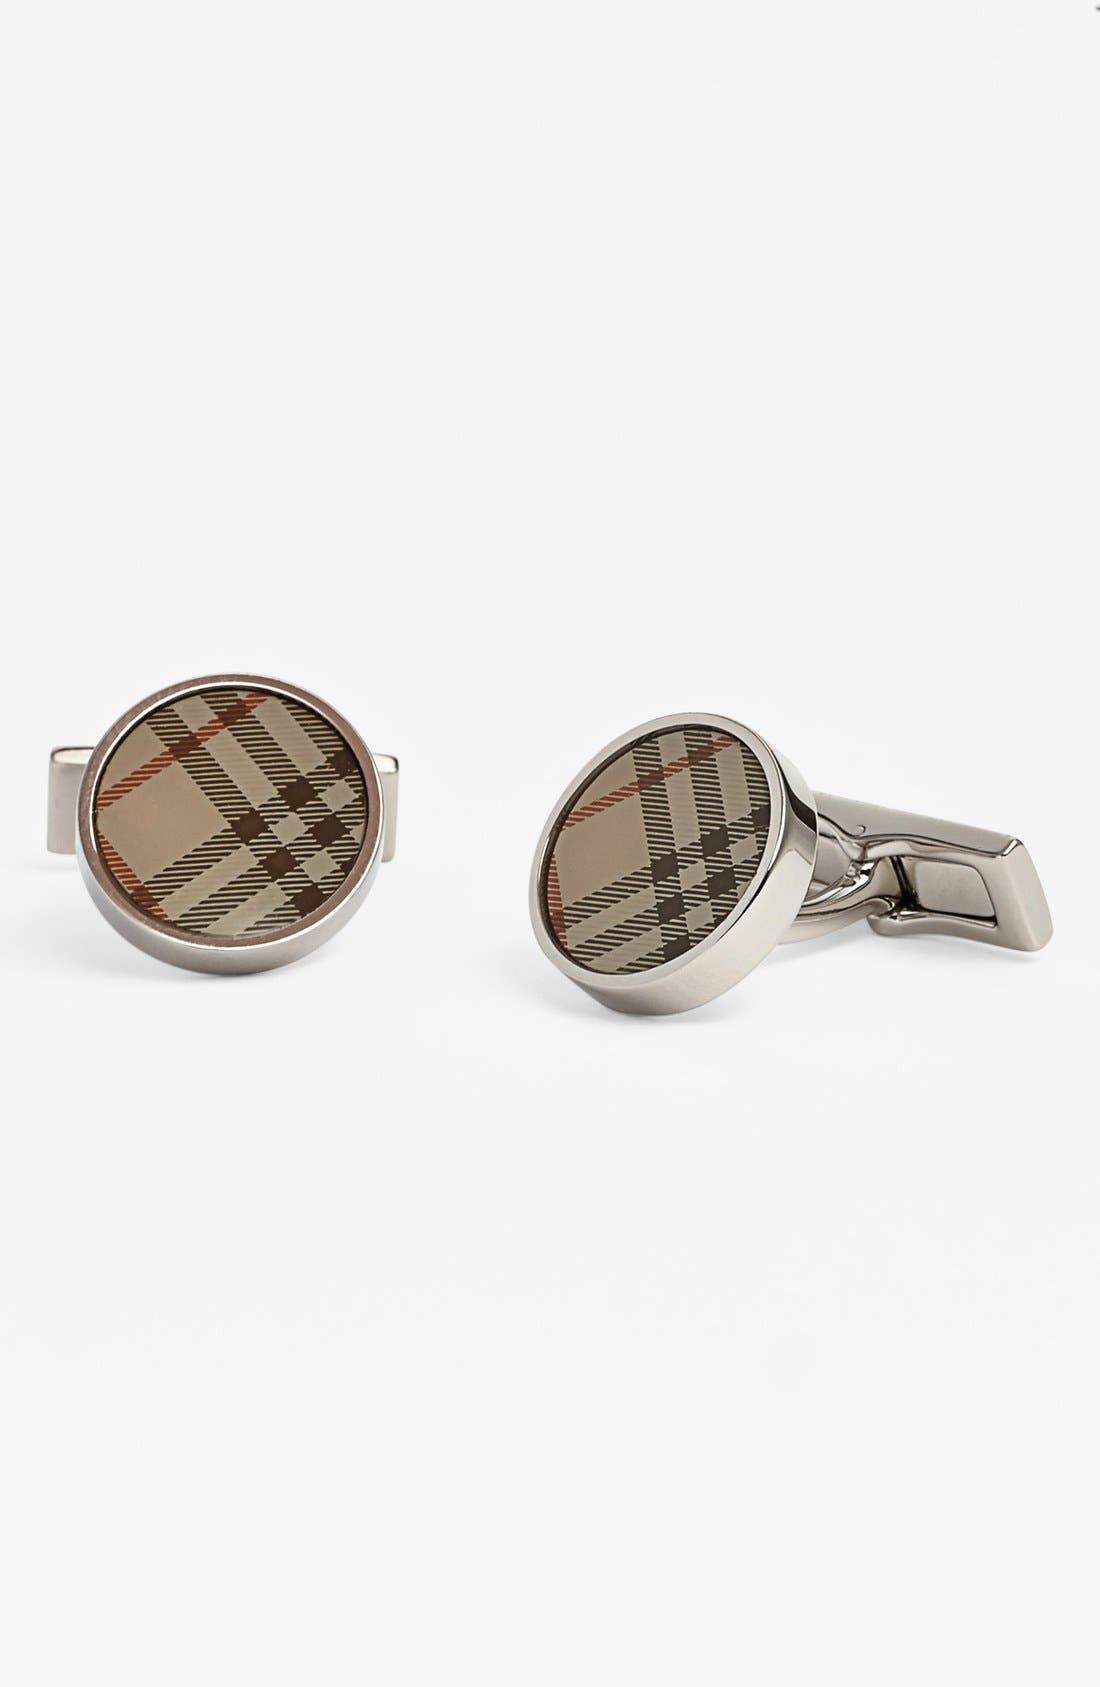 Main Image - Burberry Round Cuff Links